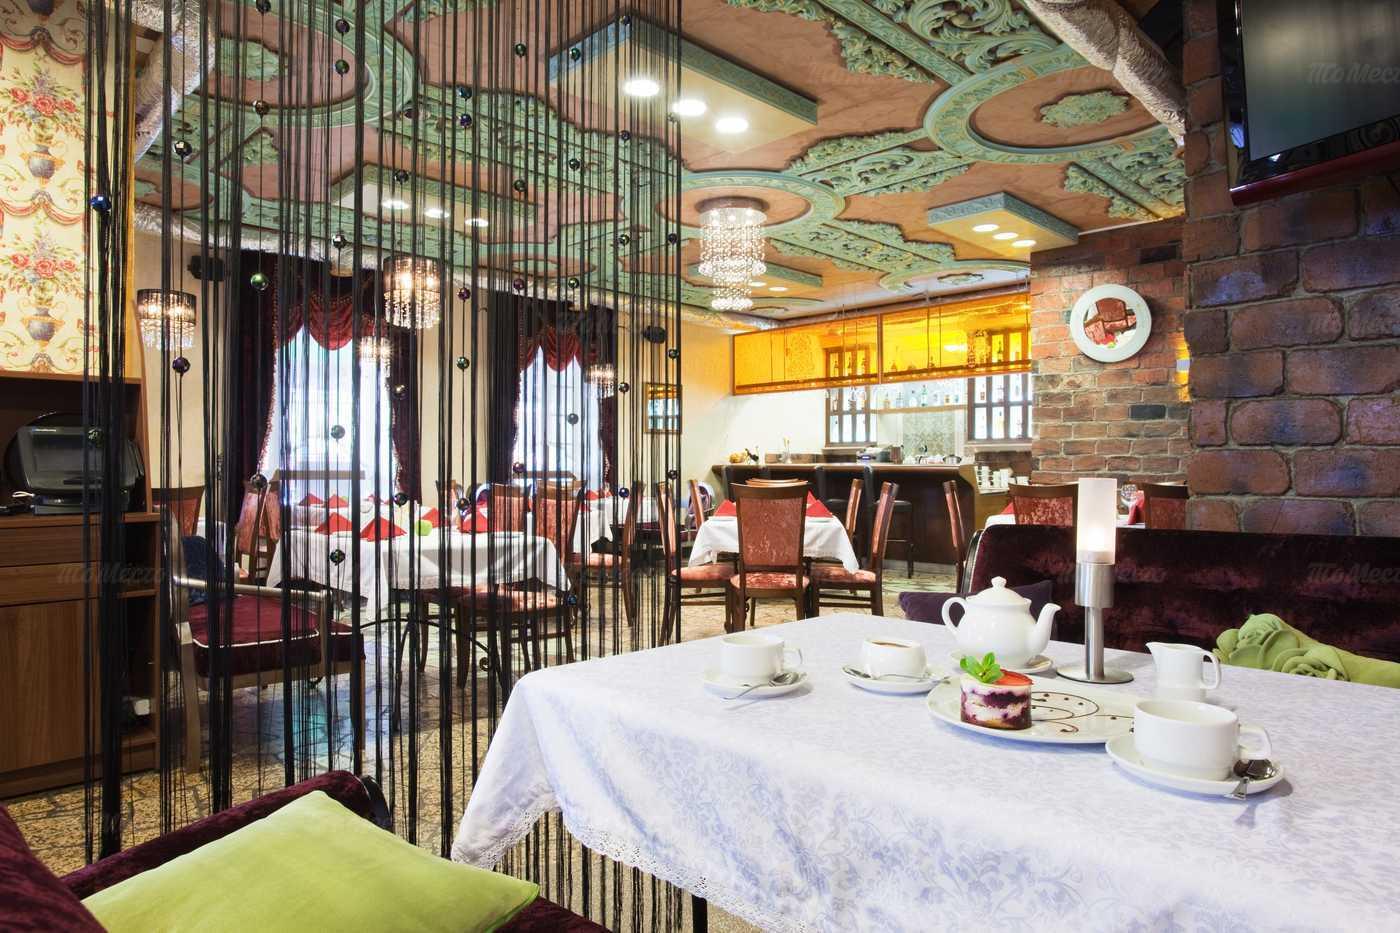 Меню кафе Грильяж на улице Академика Шварца